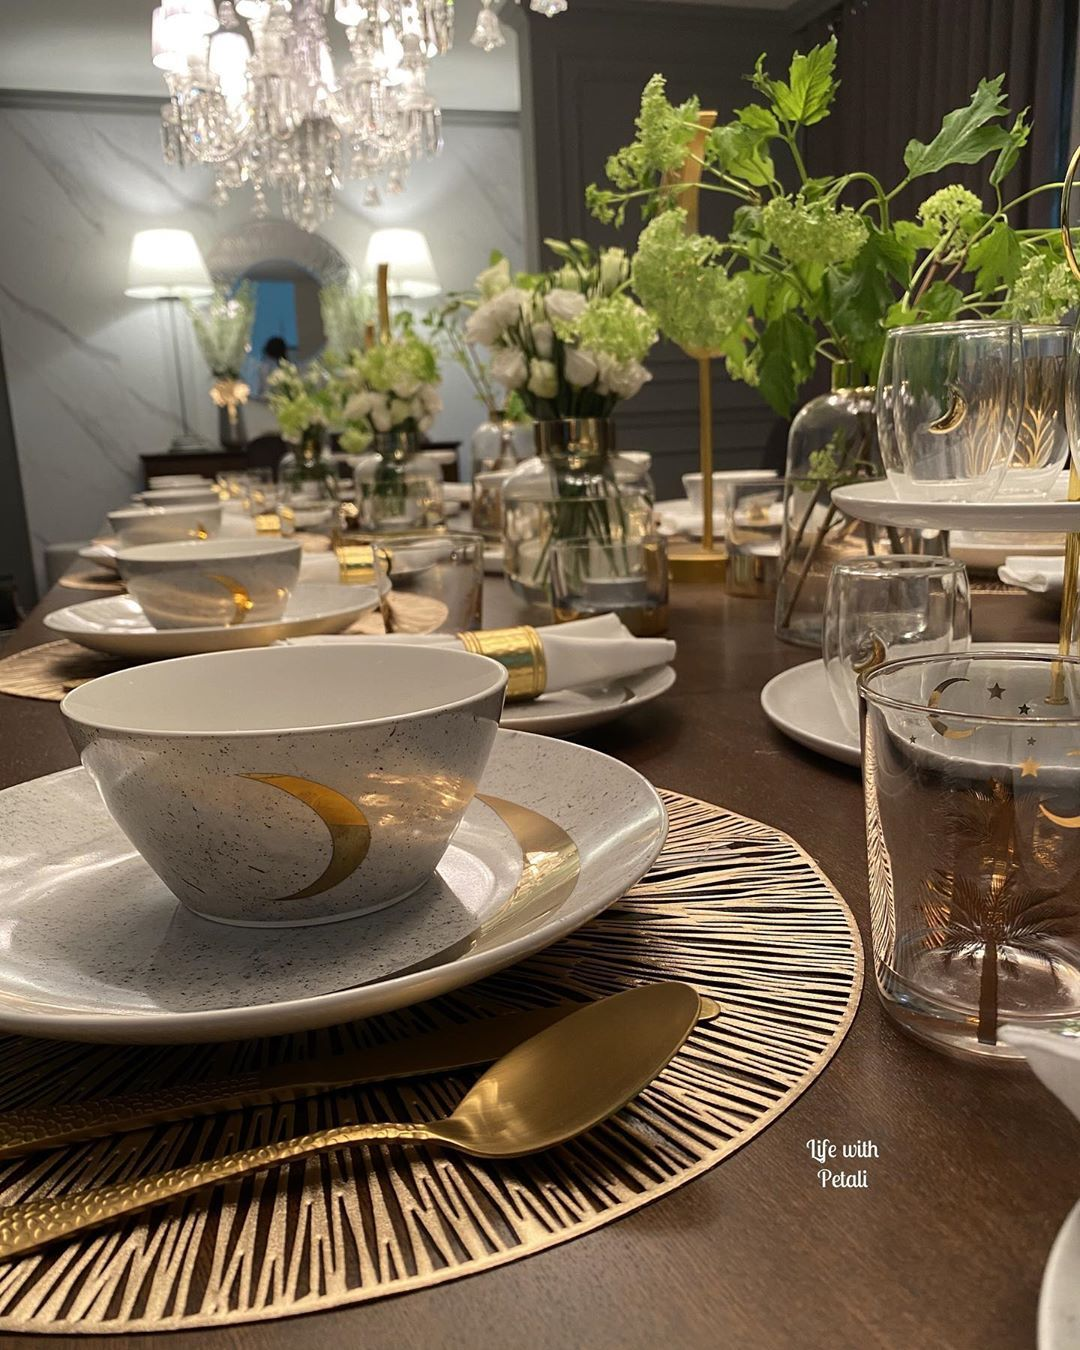 Life With Petali On Instagram وراء الكواليس مع تجهيزات ابيات لرمضان اليوم حطيتلكم الترتيبات الي سويتها مع ابيات لغرفة معيشة وغ Table Settings Table Settings